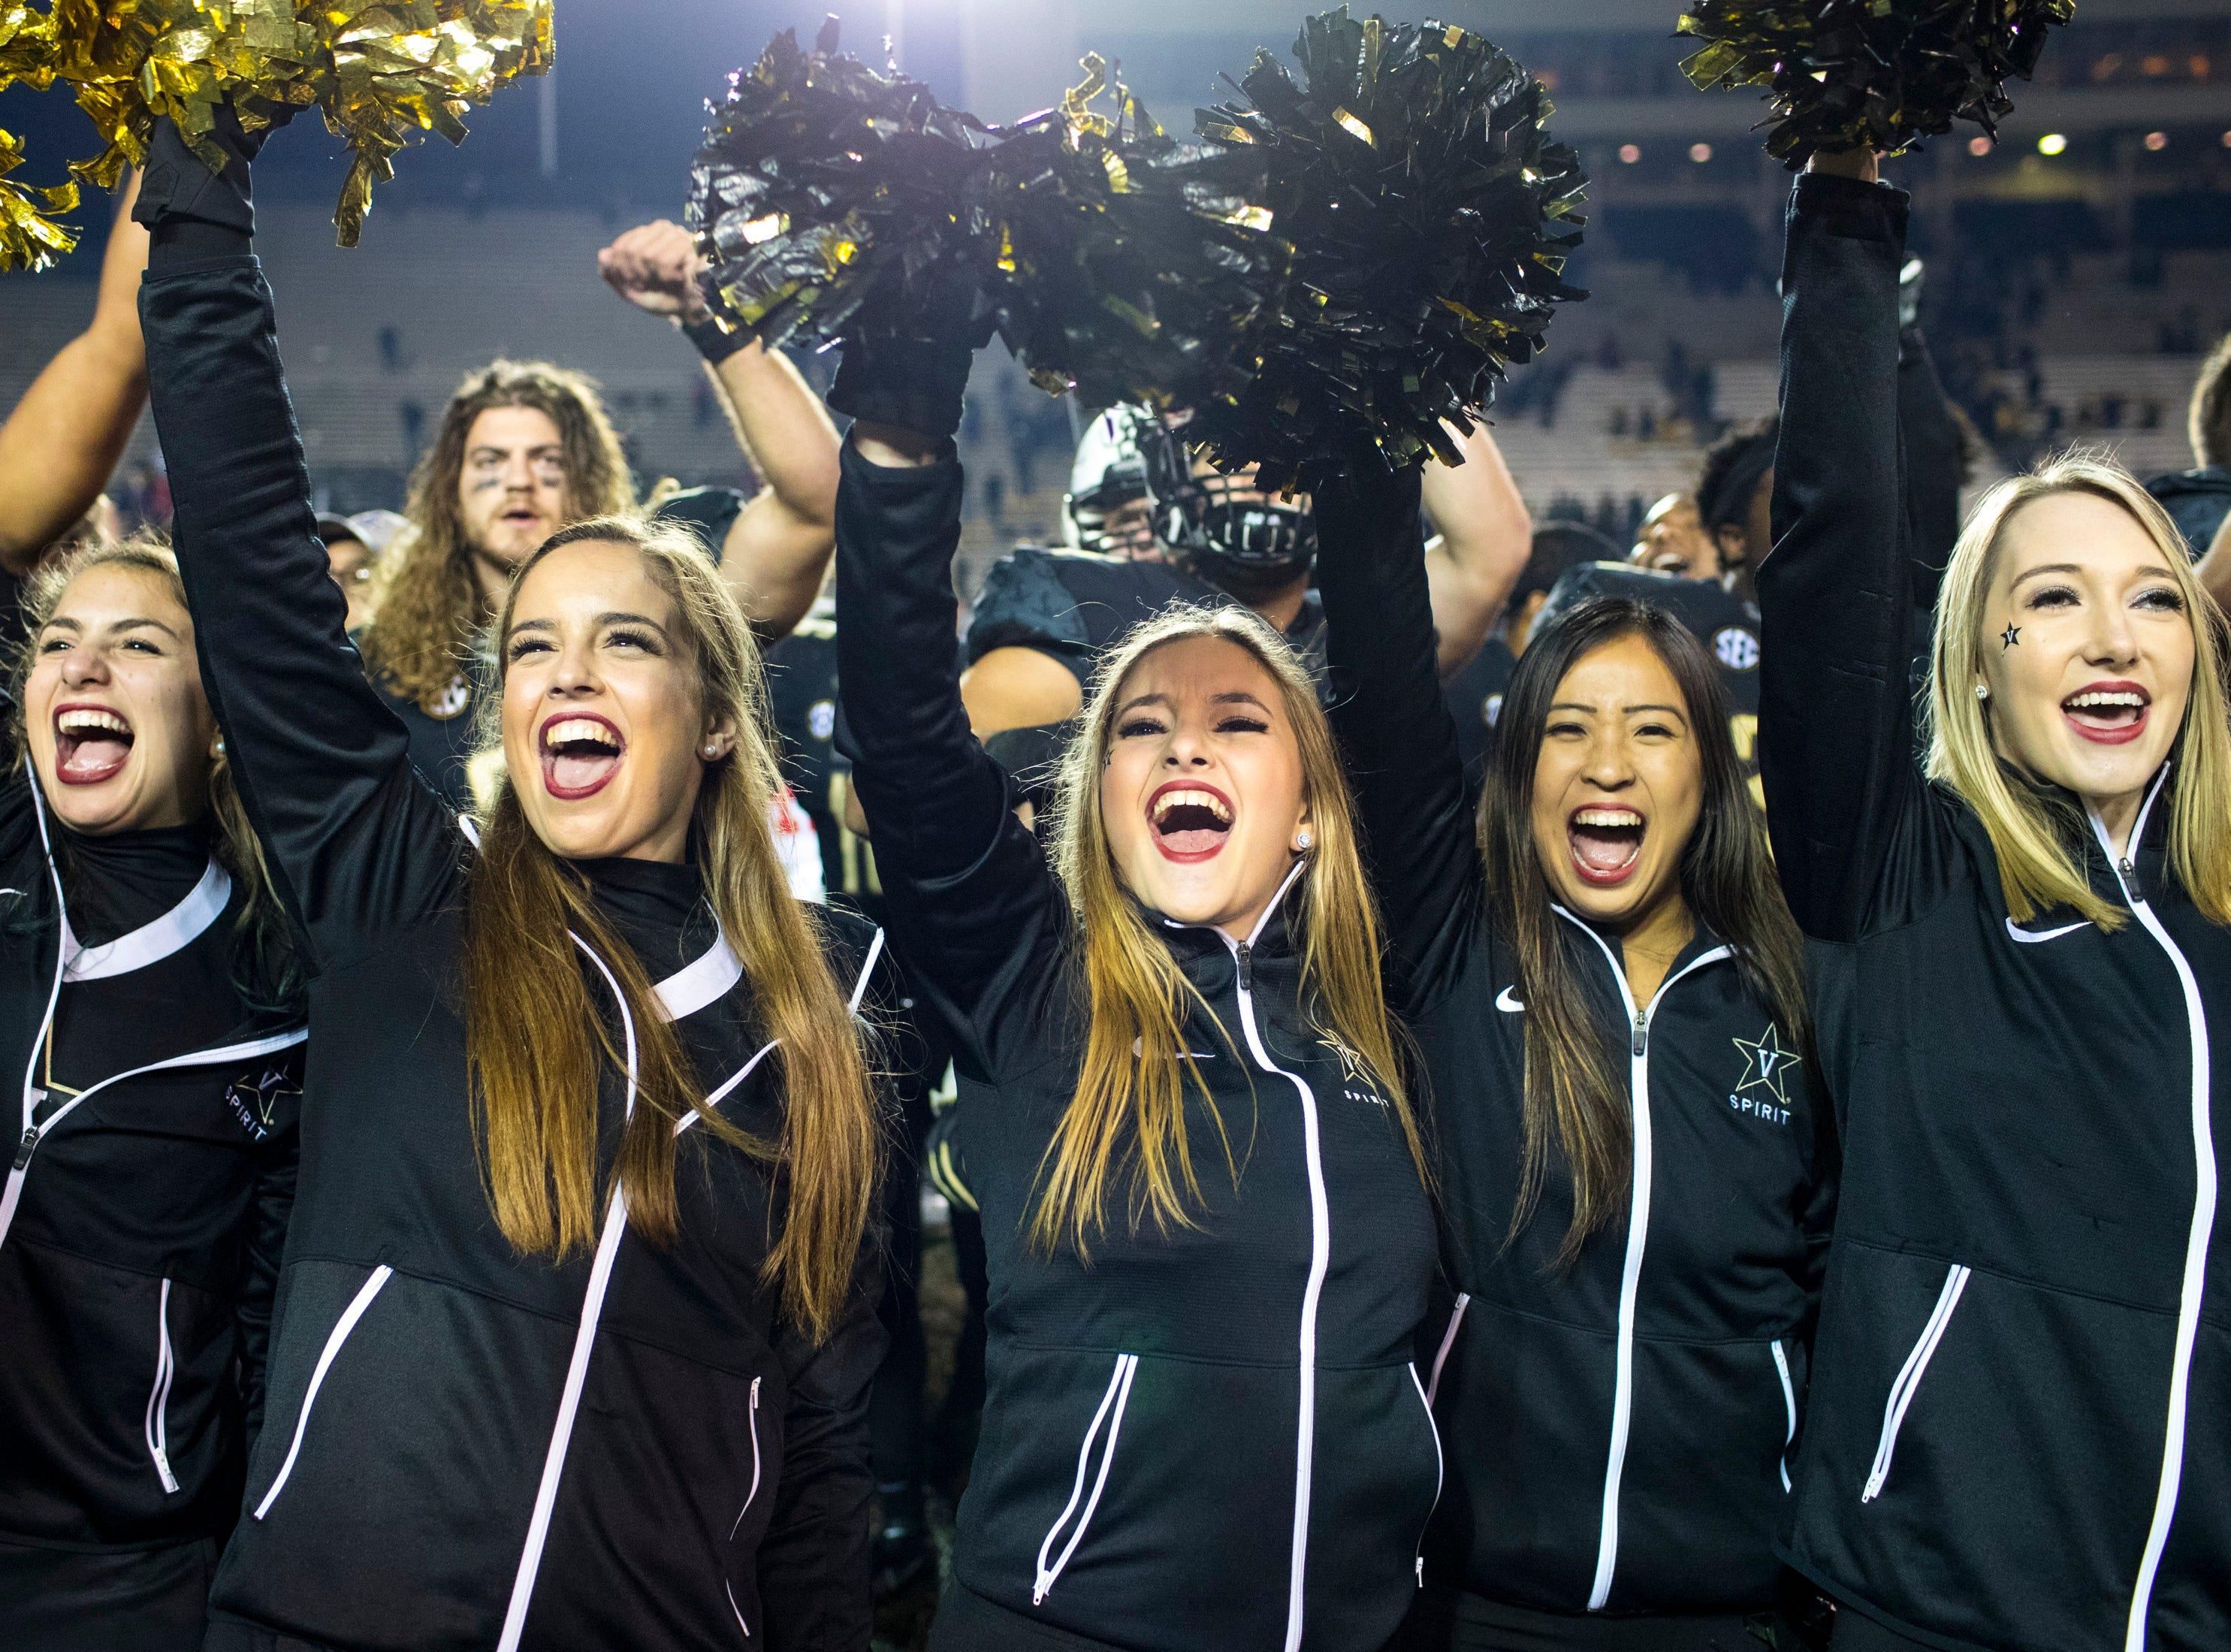 Vanderbilt's cheerleaders cheer after Vanderbilt's game against Ole Miss at Vanderbilt Stadium in Nashville on Saturday, Nov. 17, 2018.